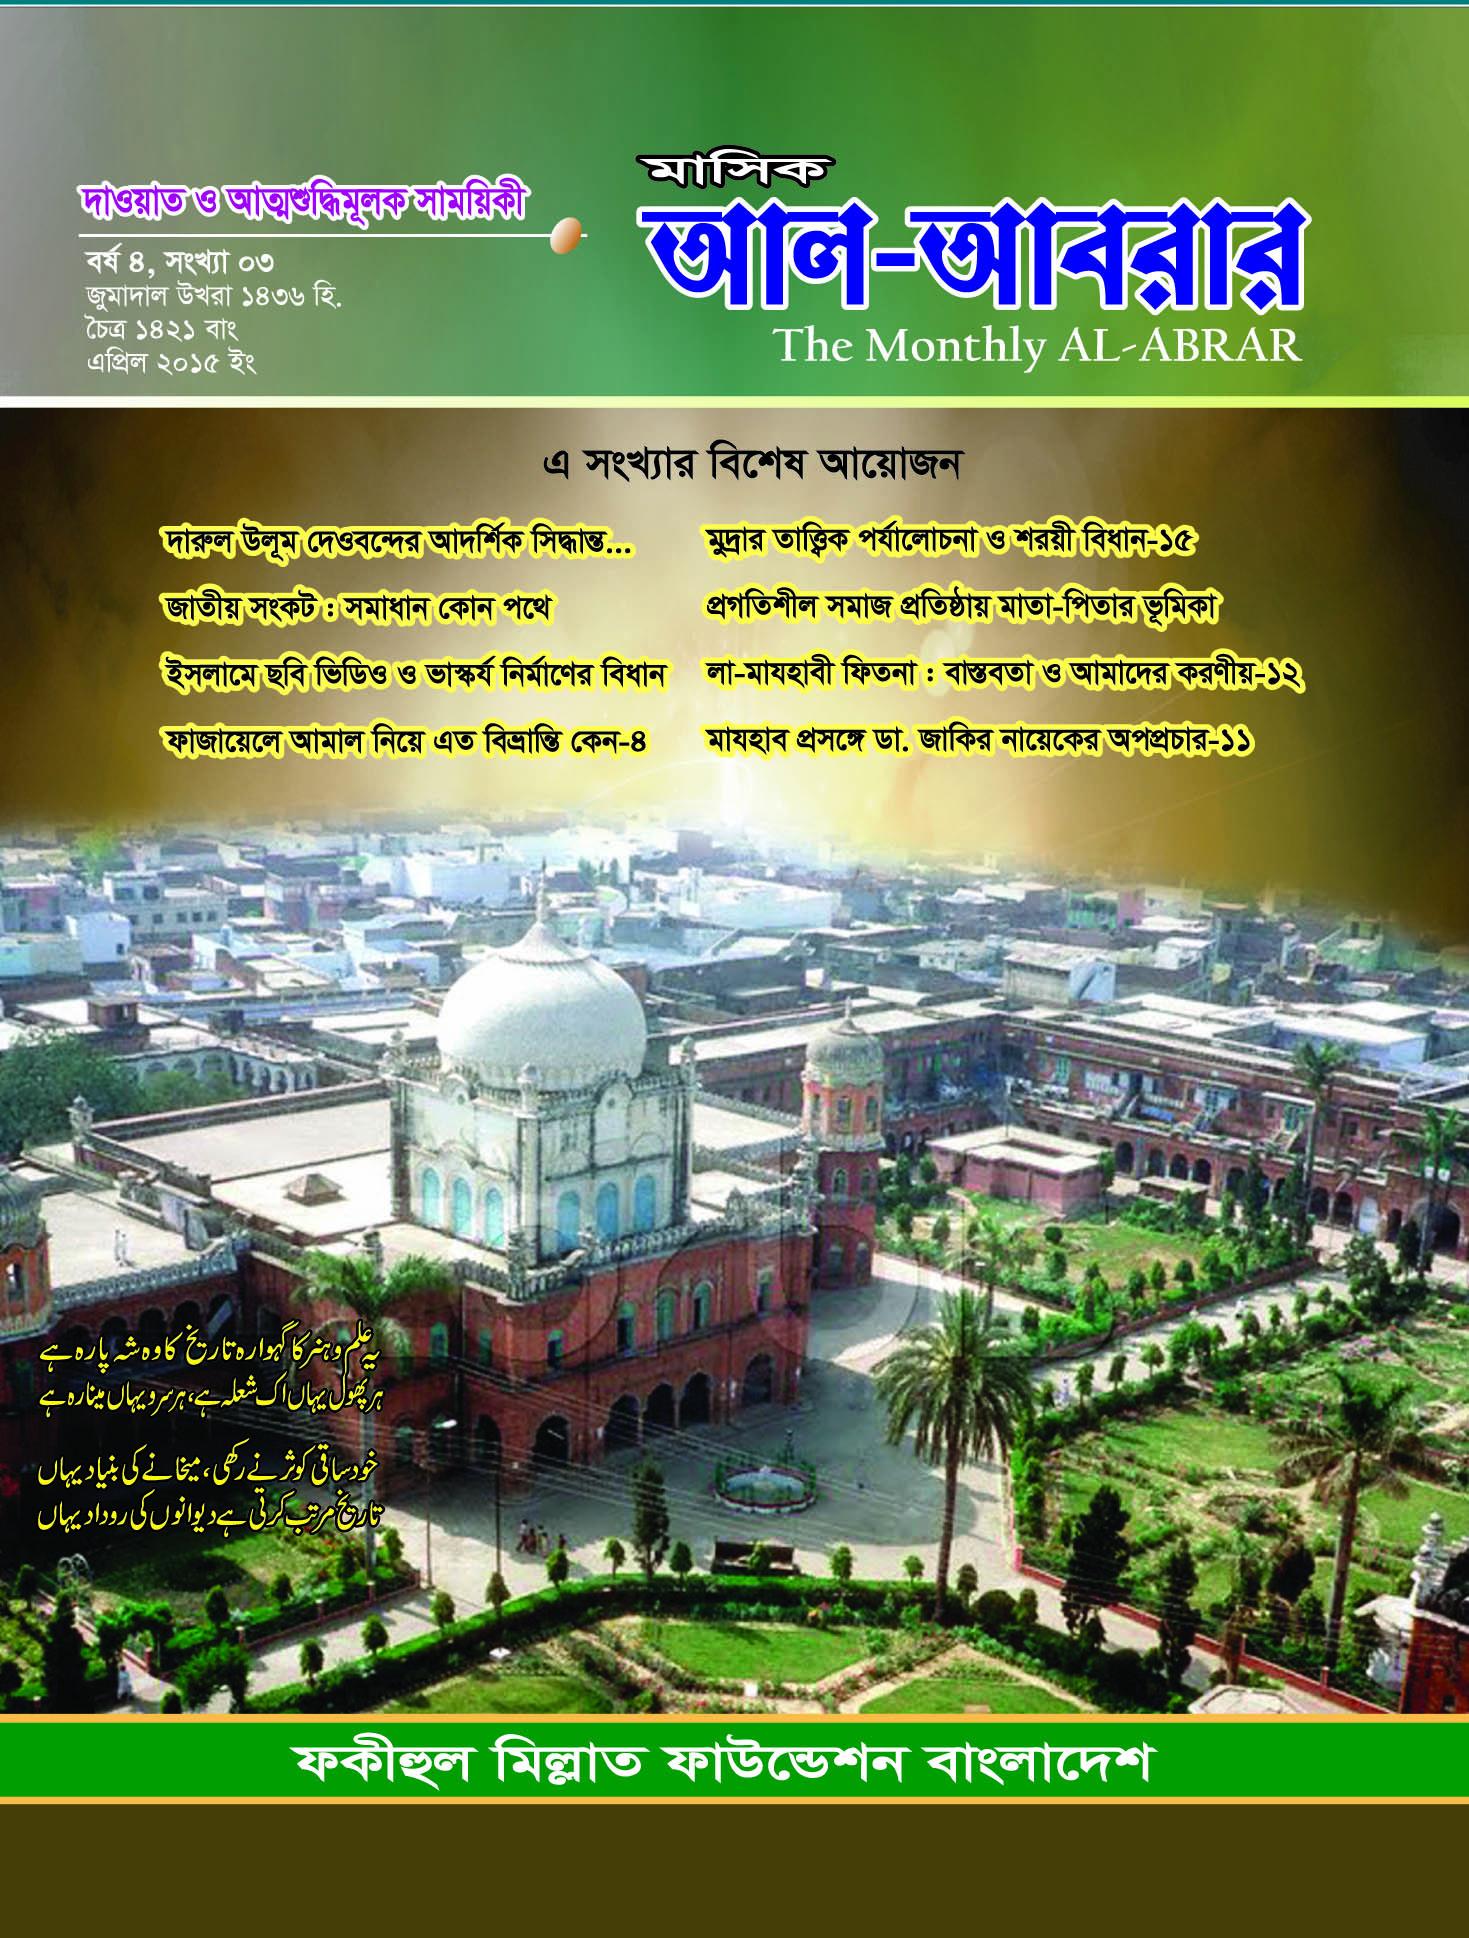 Cover Finel 04-2015-Fainal copy